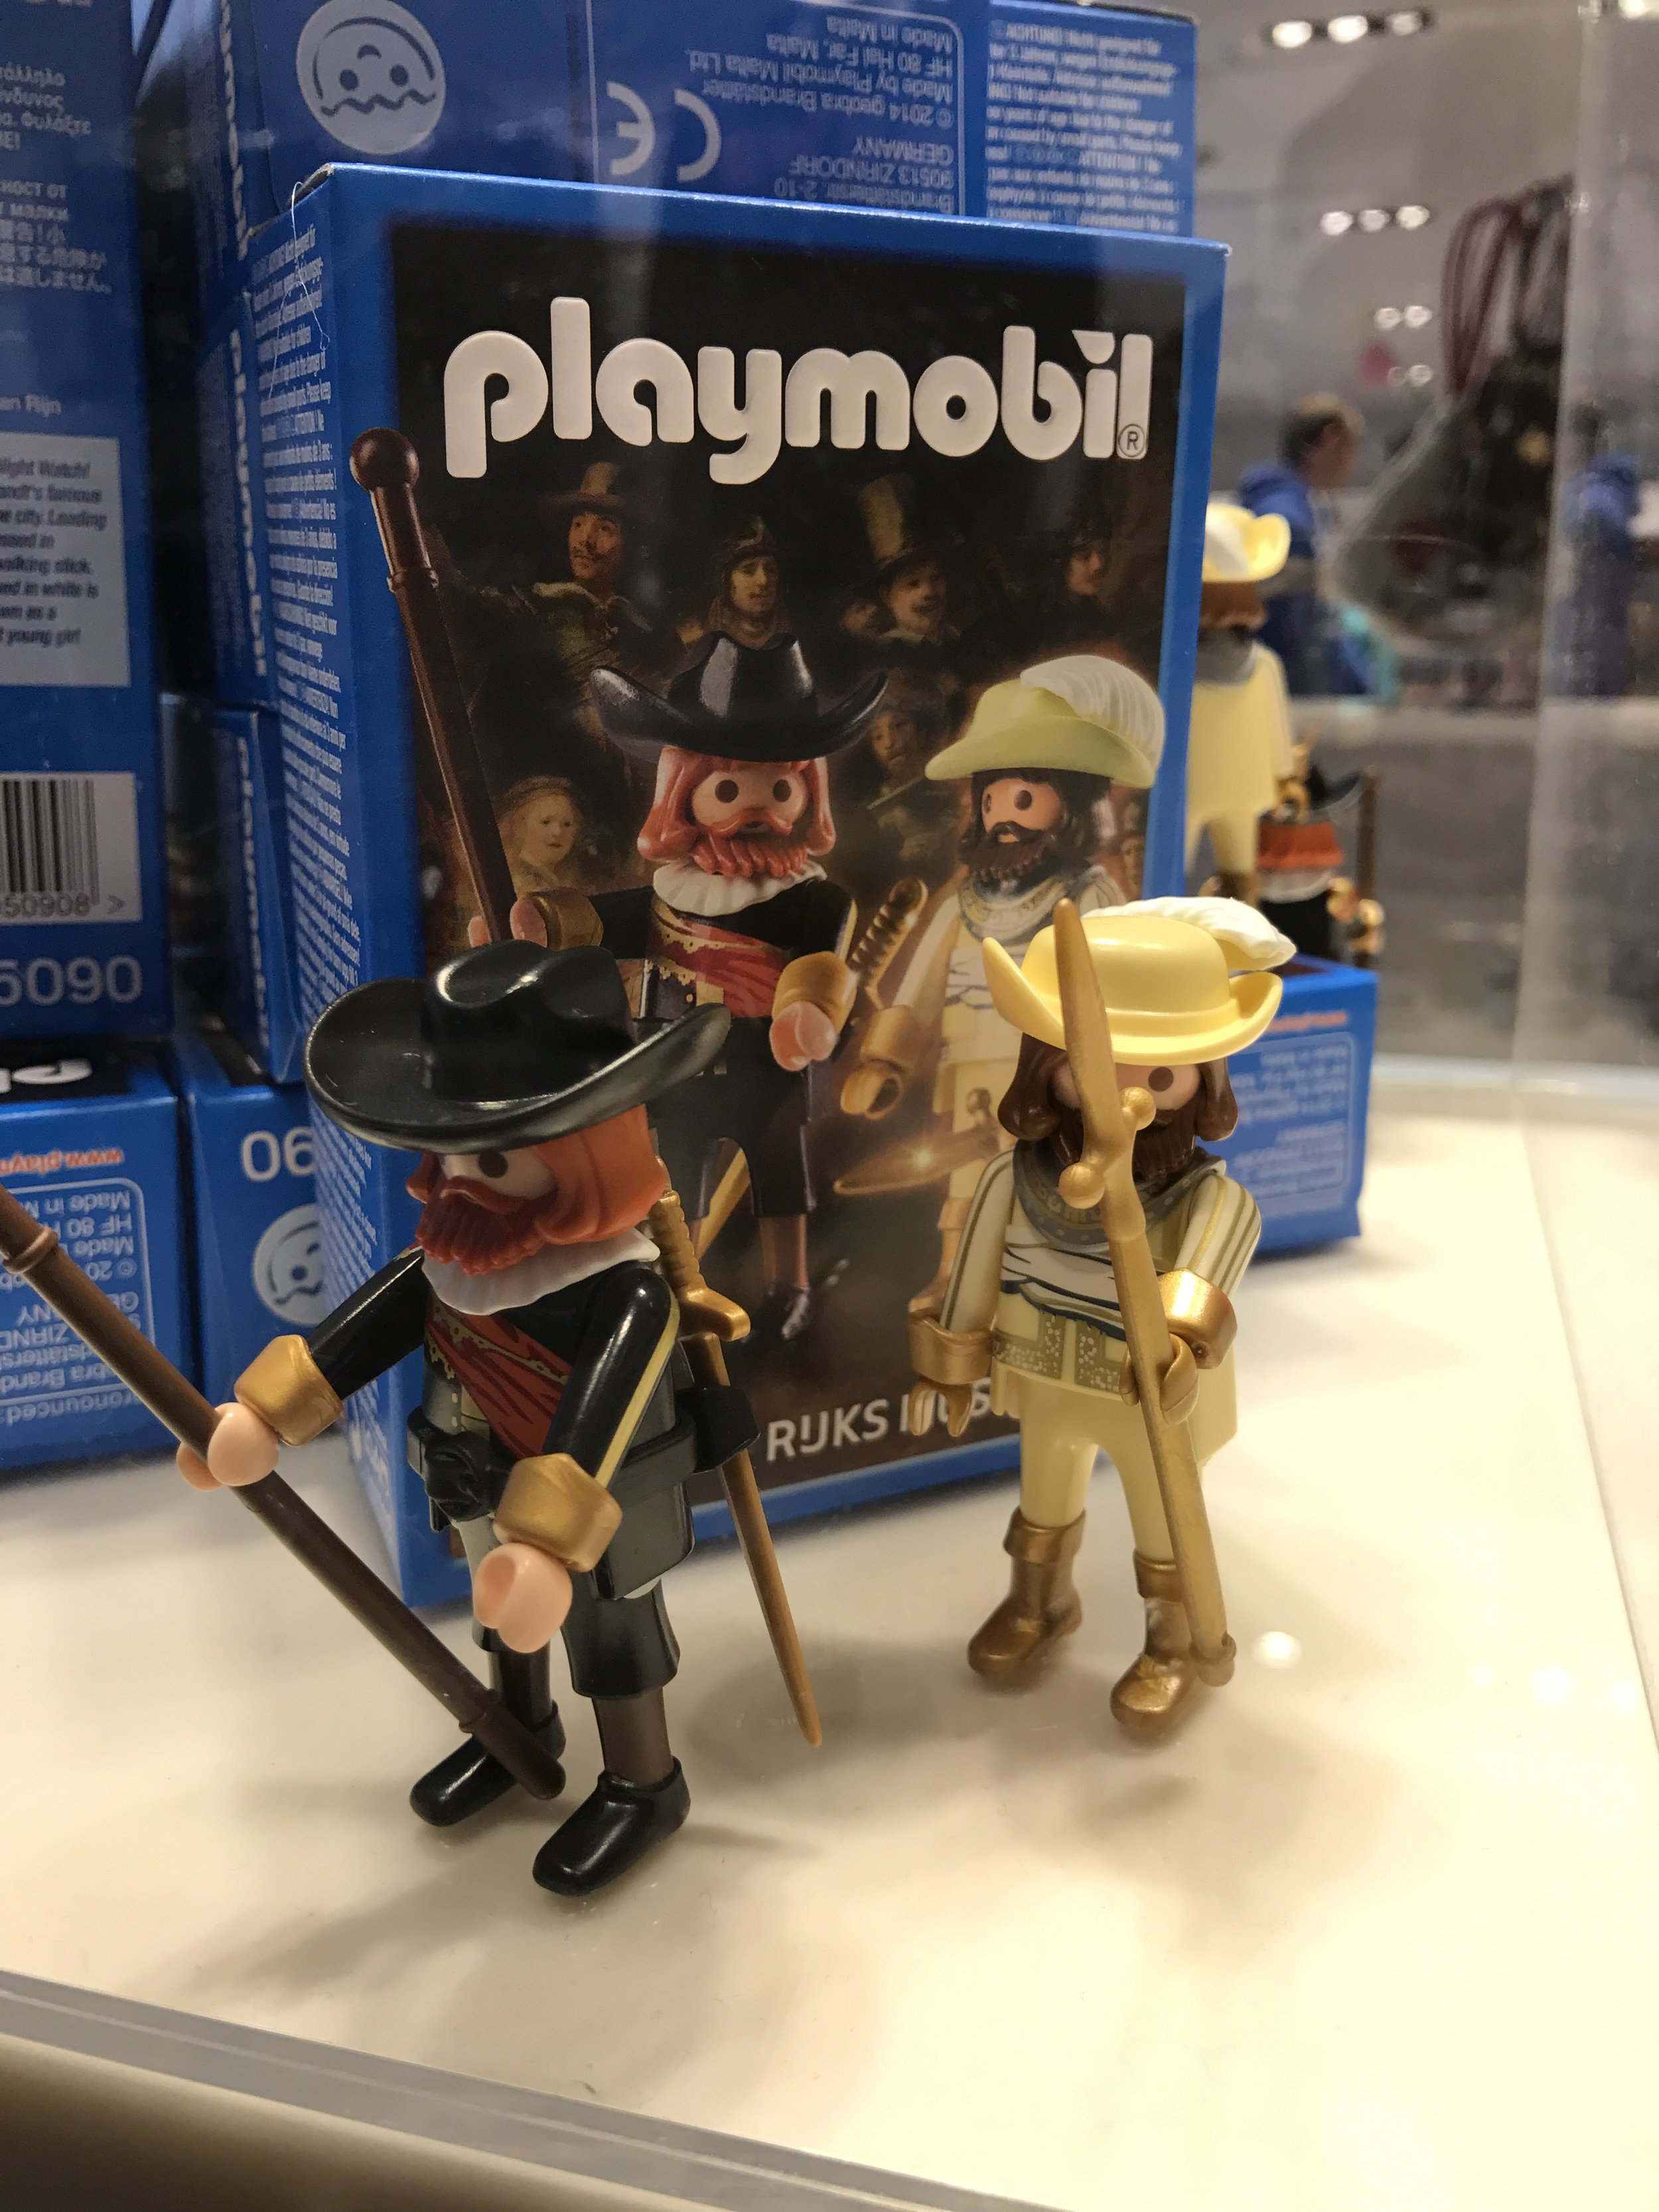 Rijksmuseum, Playmobil, De Museumpodcast